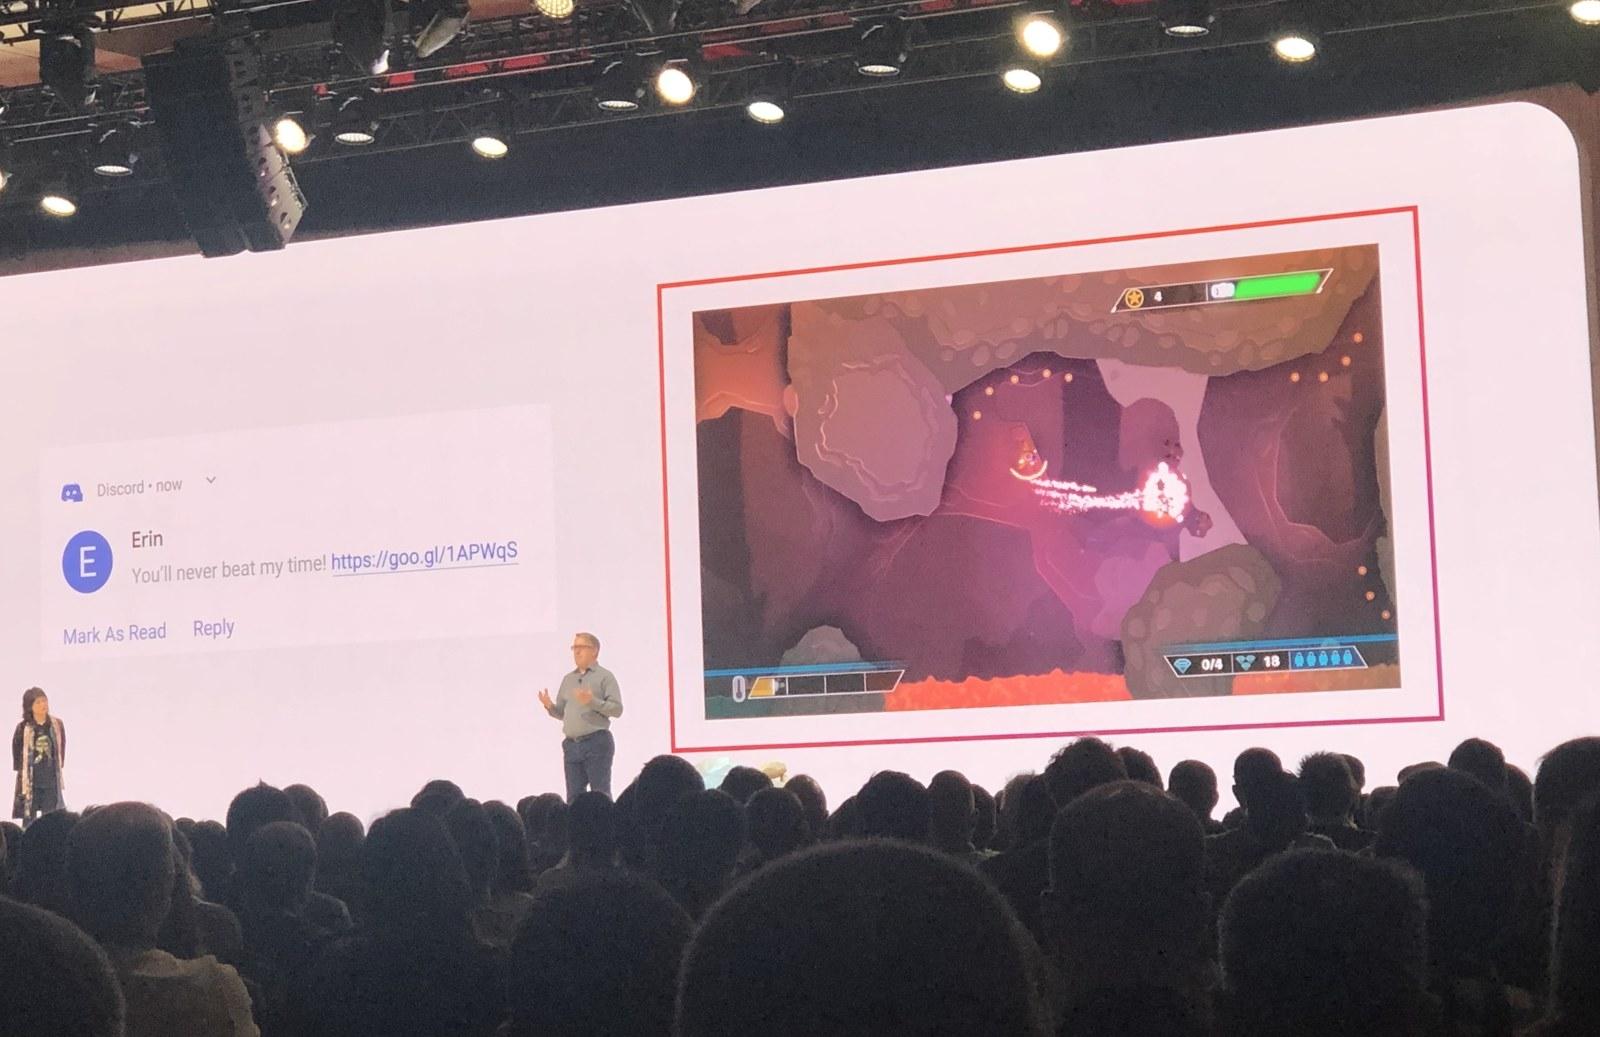 Google Stadia's sharing function